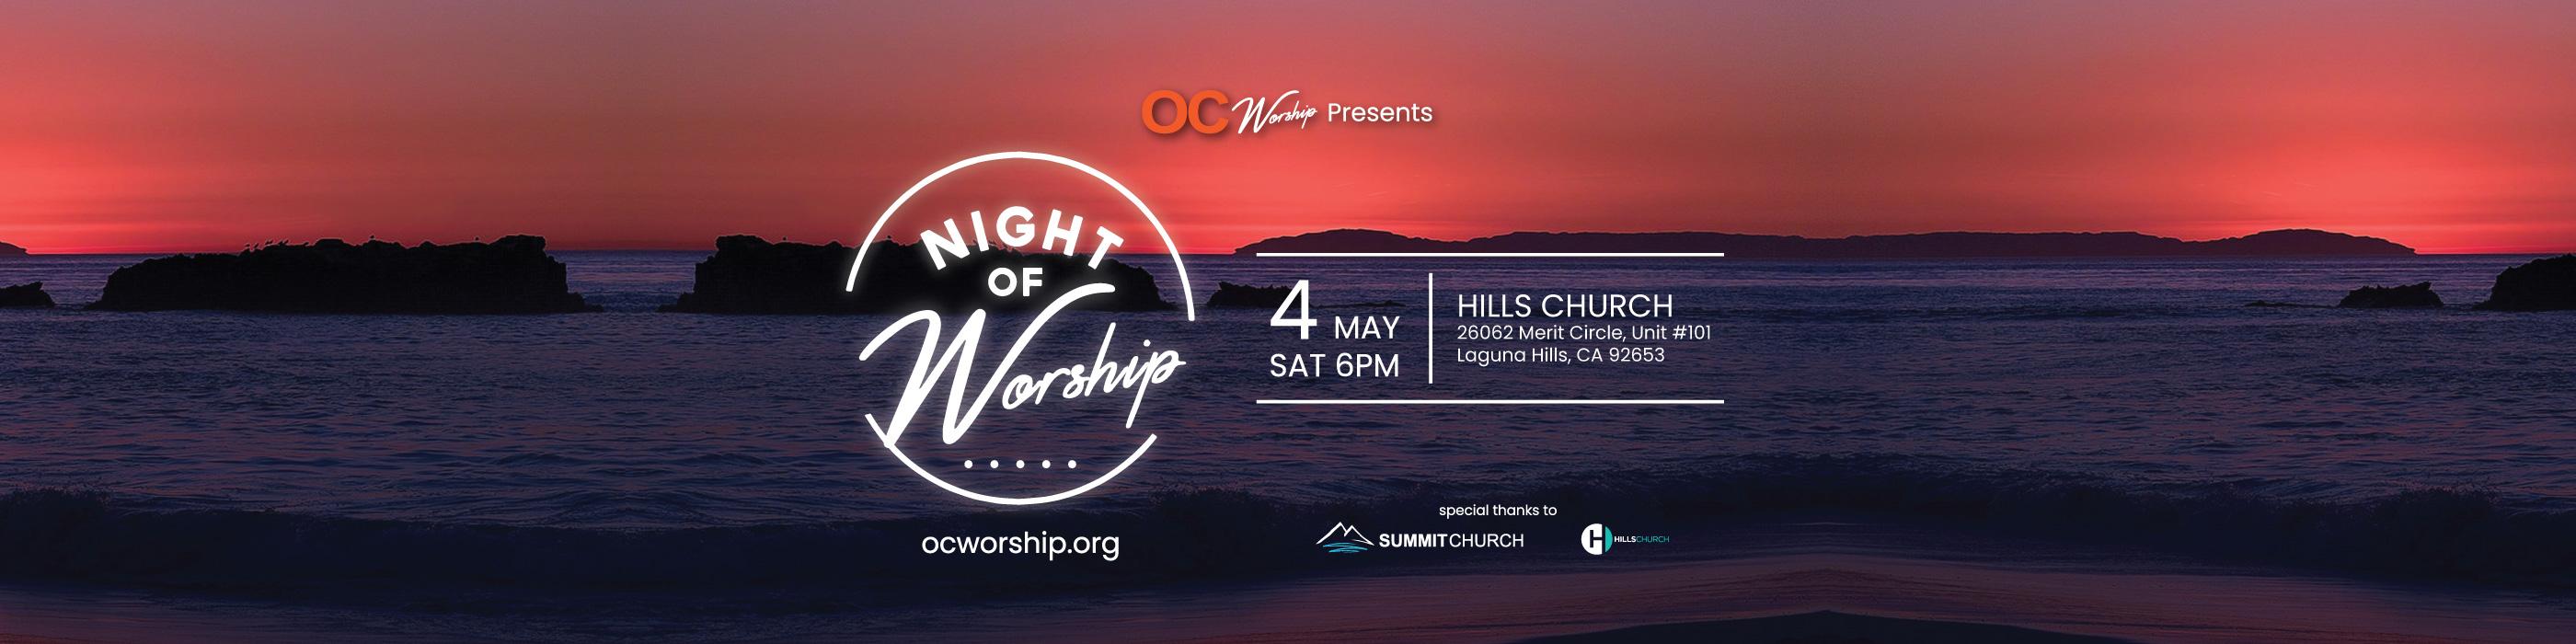 Summit-Church-ocworship-050419-WEB-2800x700